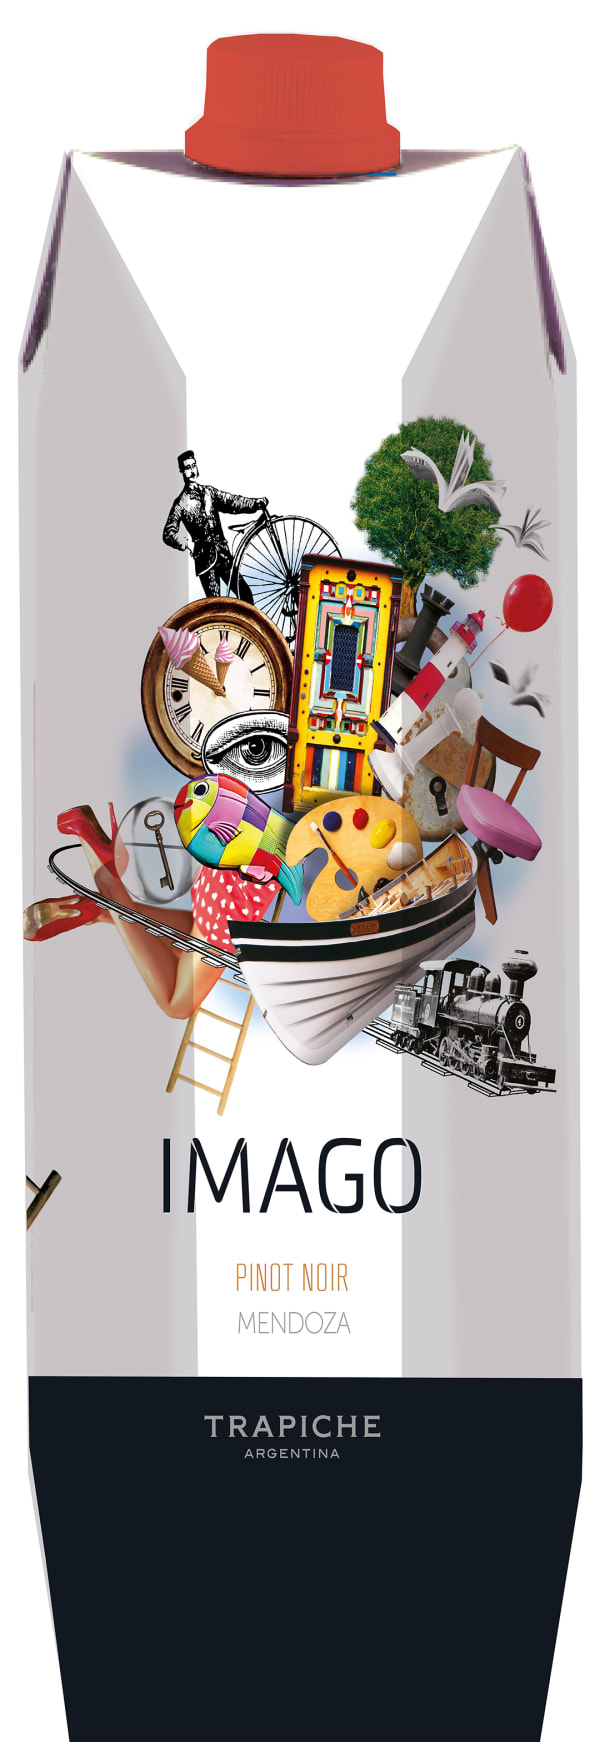 Trapiche Imago Pinot Noir 2015 kartongförpackning